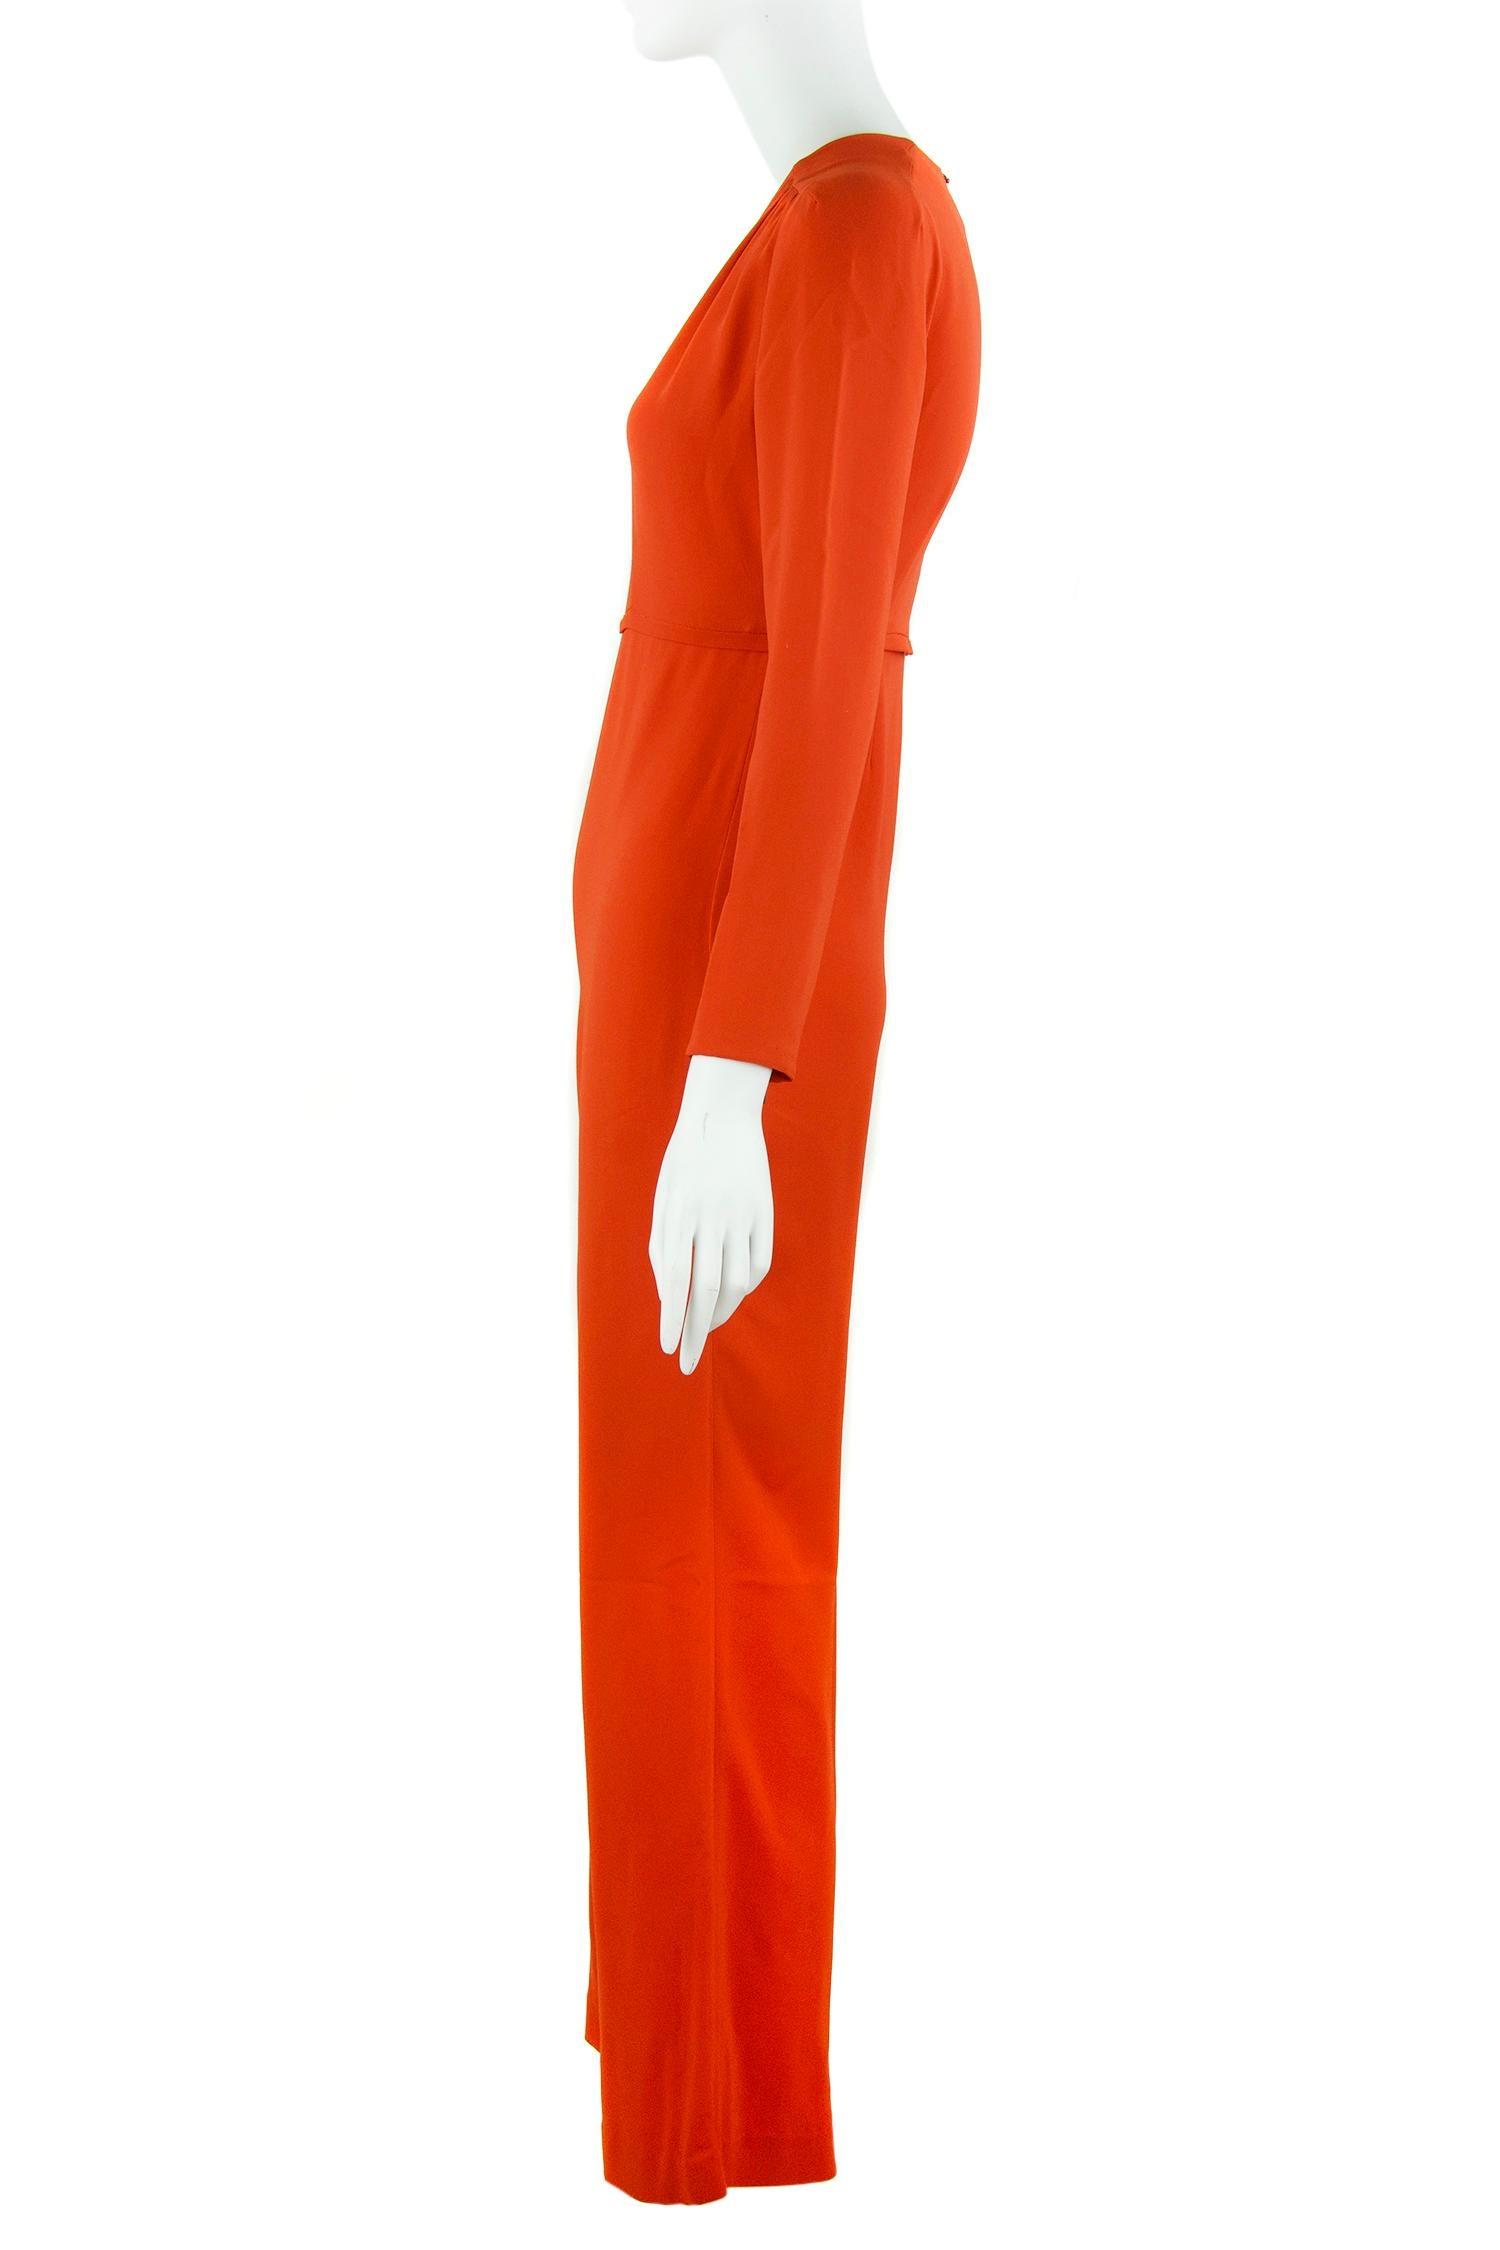 67950bc18a3 Stella McCartney Burnt Orange Long Sleeve Jumpsuit - IT 36 For Sale at  1stdibs